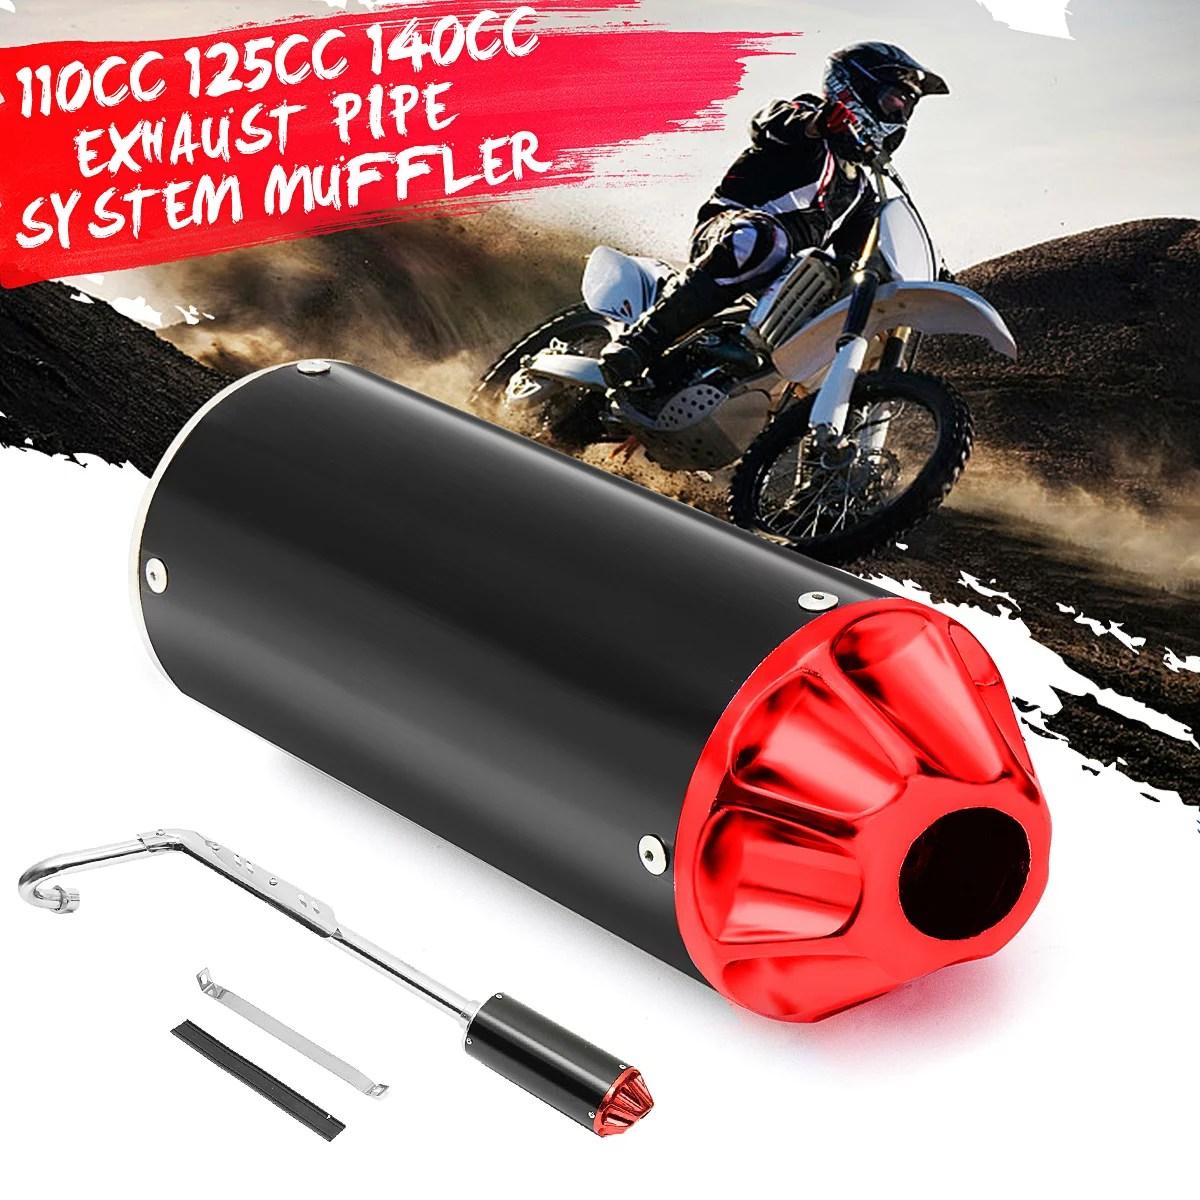 performance cnc exhaust pipe system muffler kit 110cc 125cc 140cc pit dirt bike